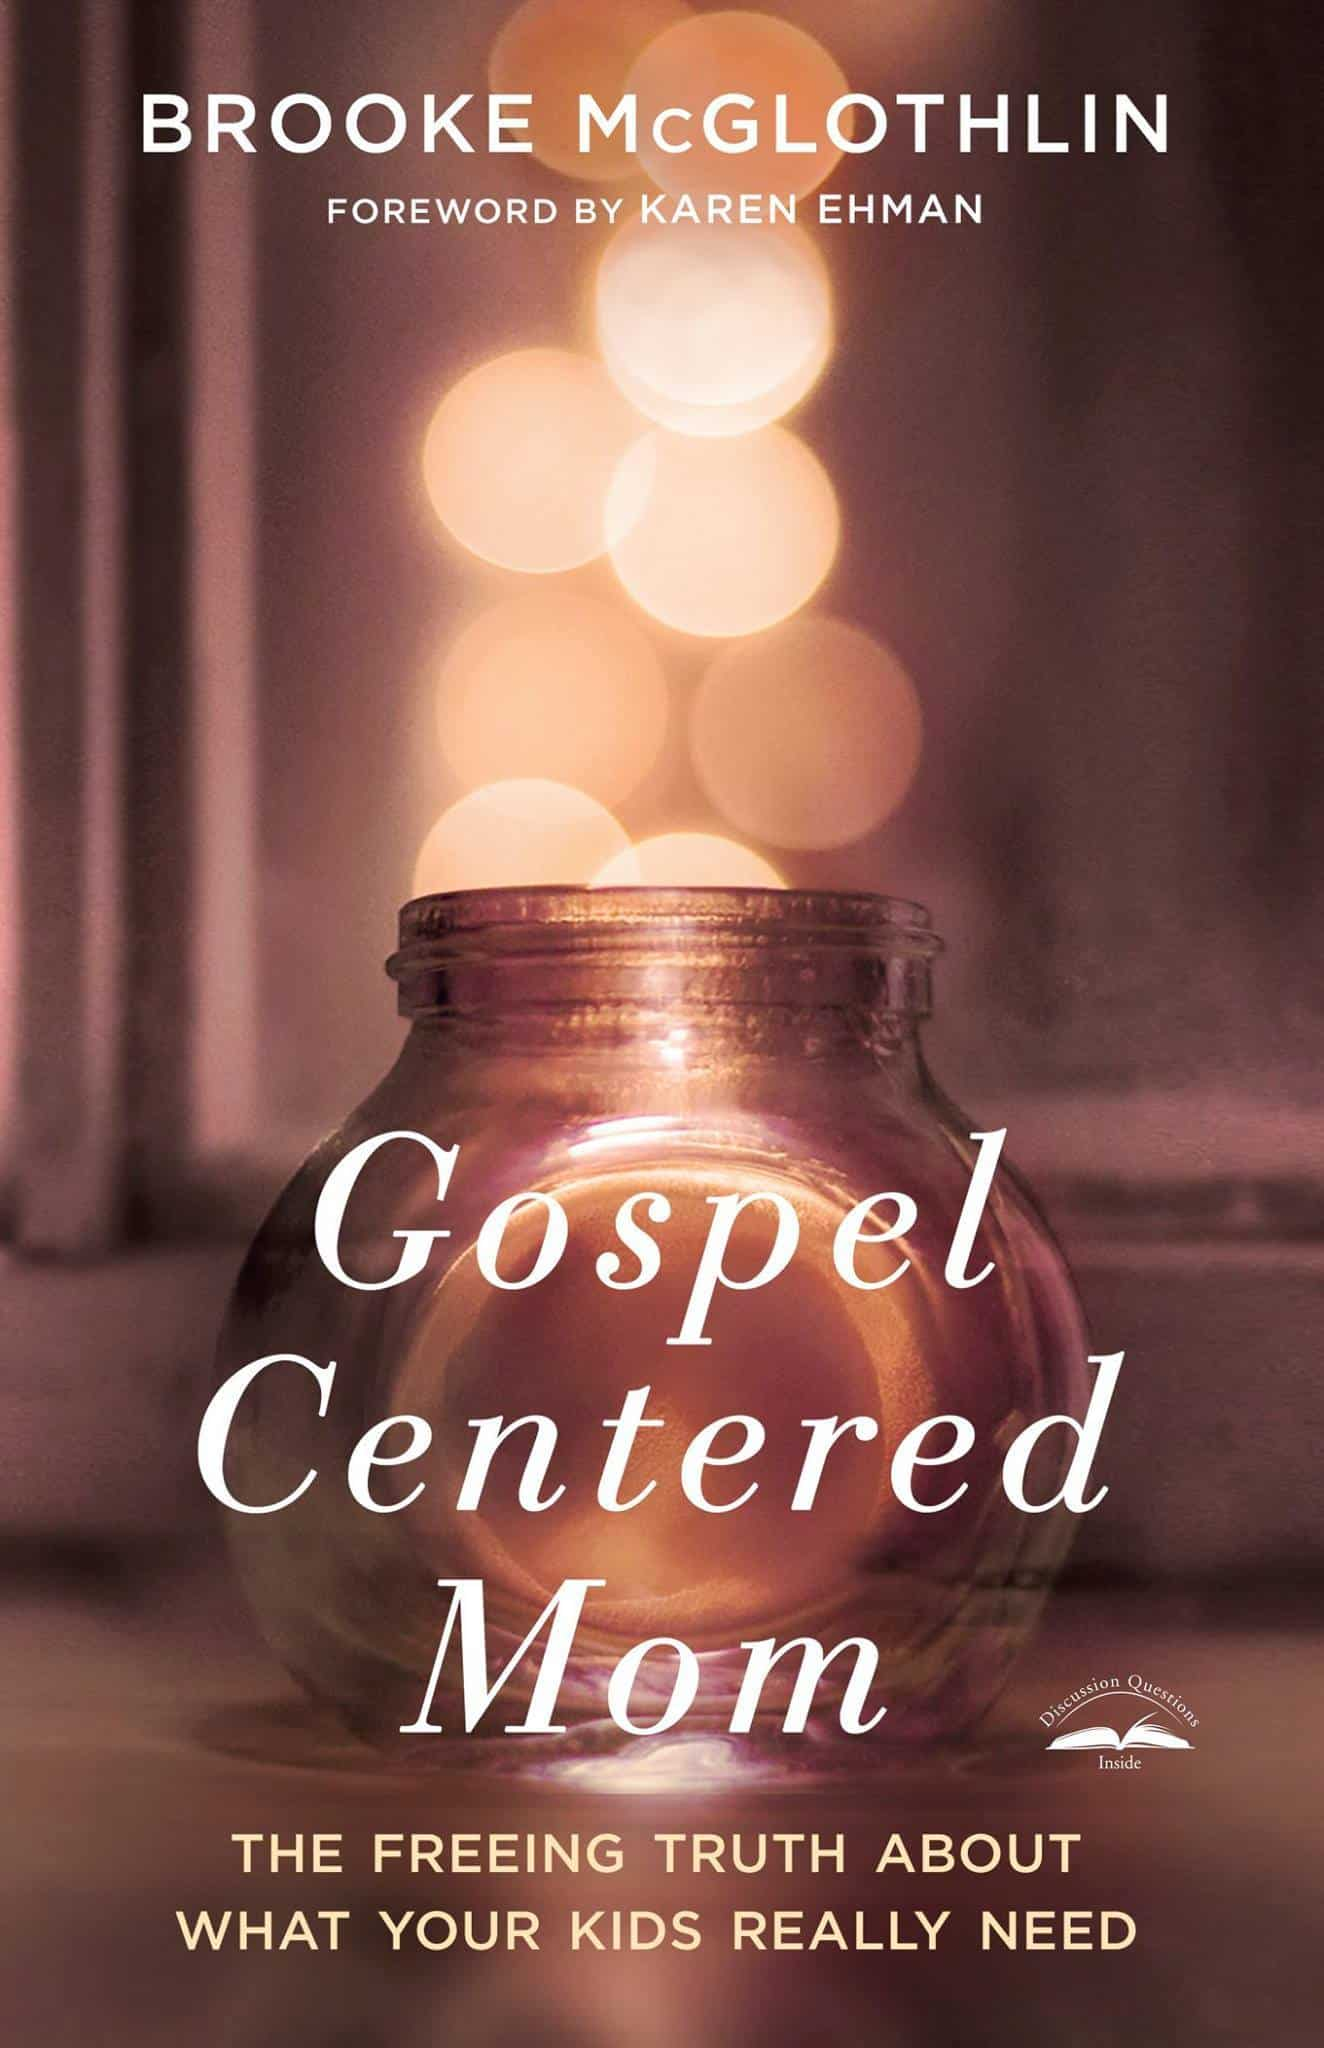 Gospel Centered Mom by Brooke McGlothlin